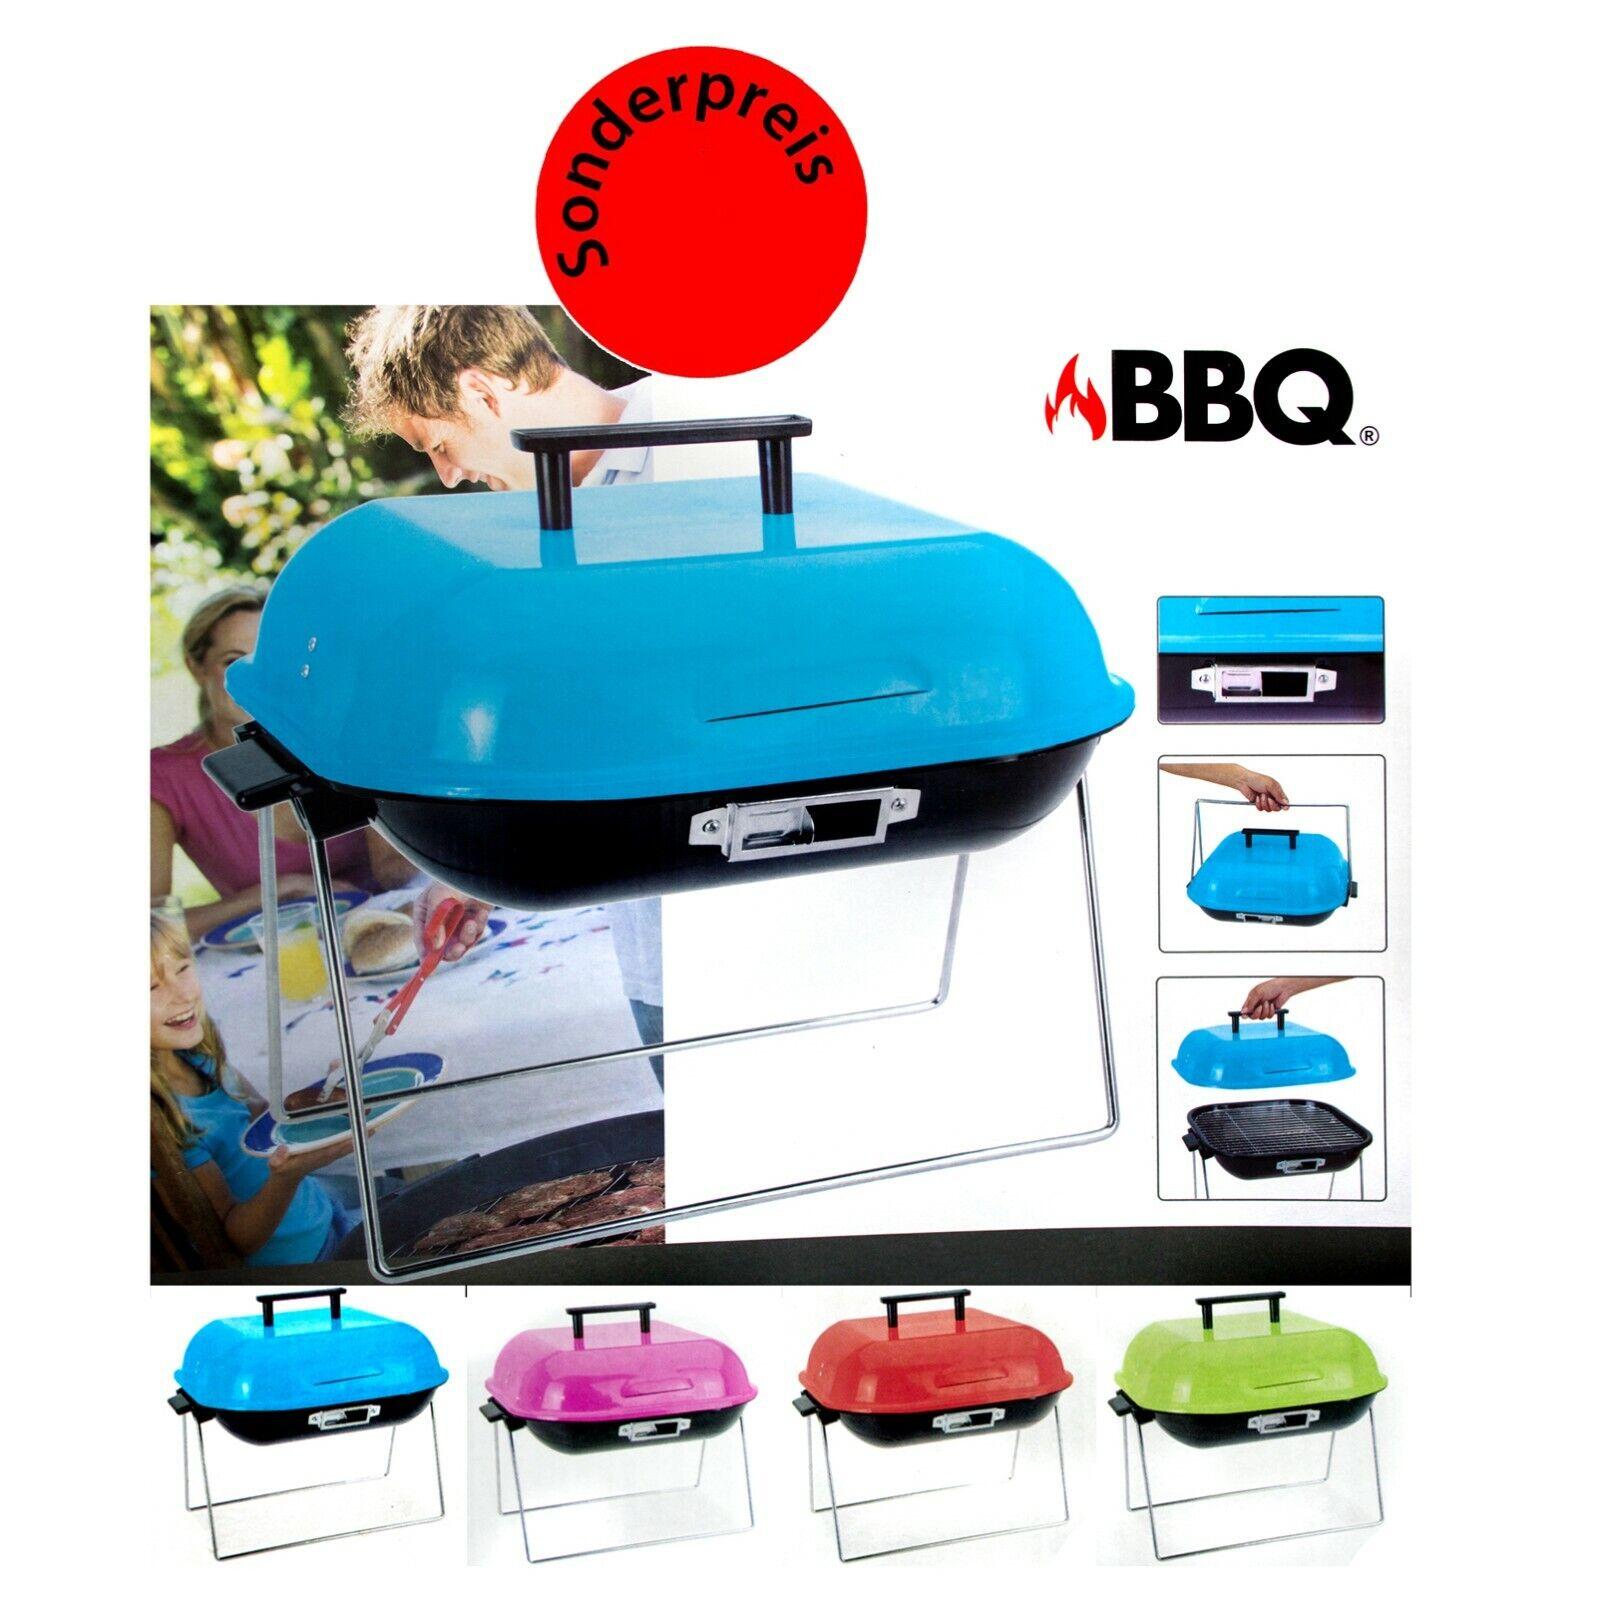 BBQ® Grill, 37 x 37 cm,Tischgrill Barbeque Klappgrill Camping Picknick Tragbar